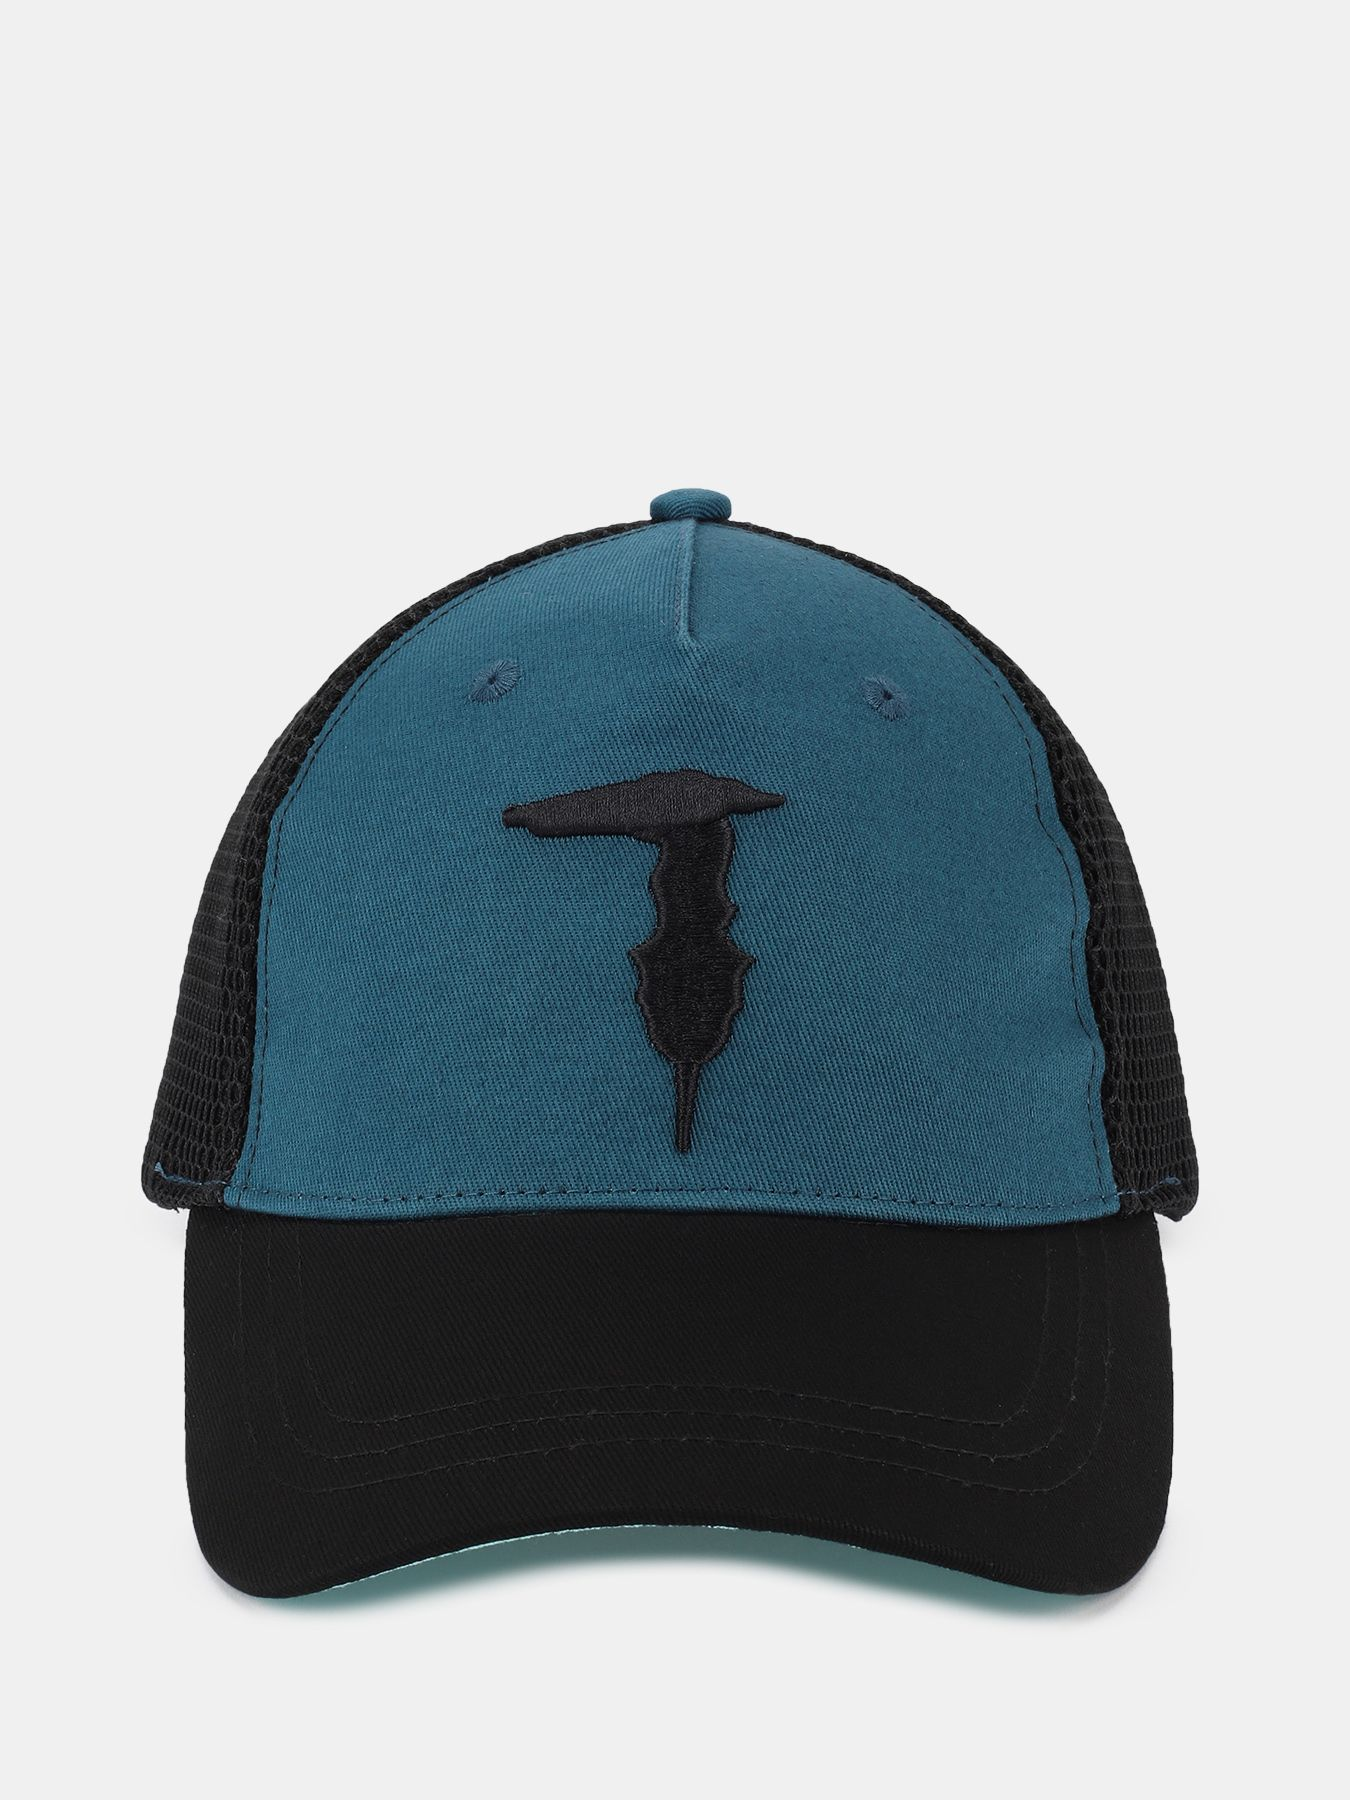 Бейсболка Trussardi Jeans Бейсболка с лого